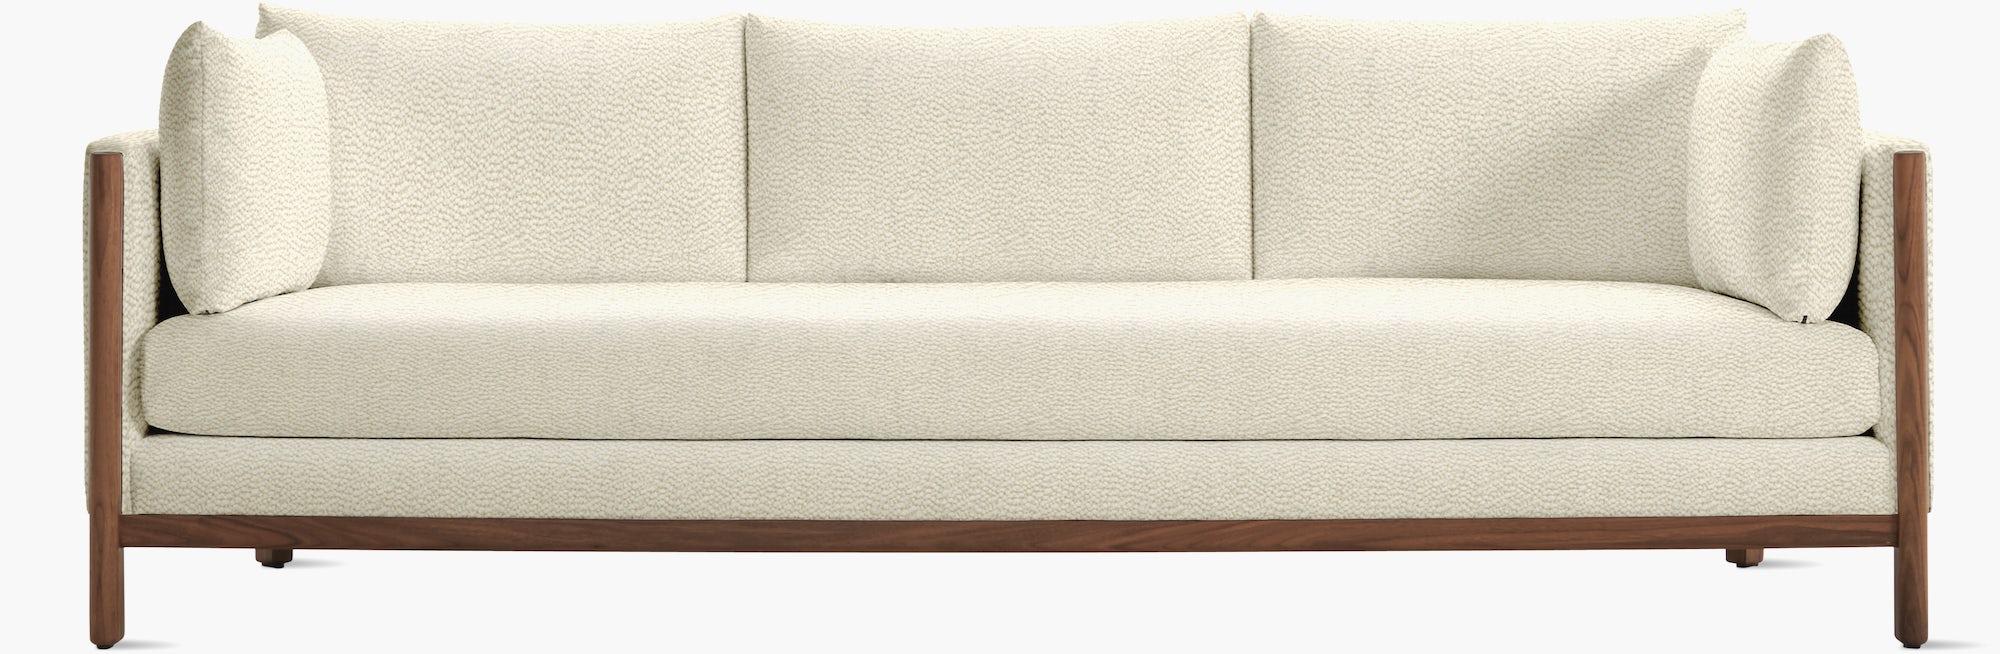 Emmy Sofa - Design Within Reach